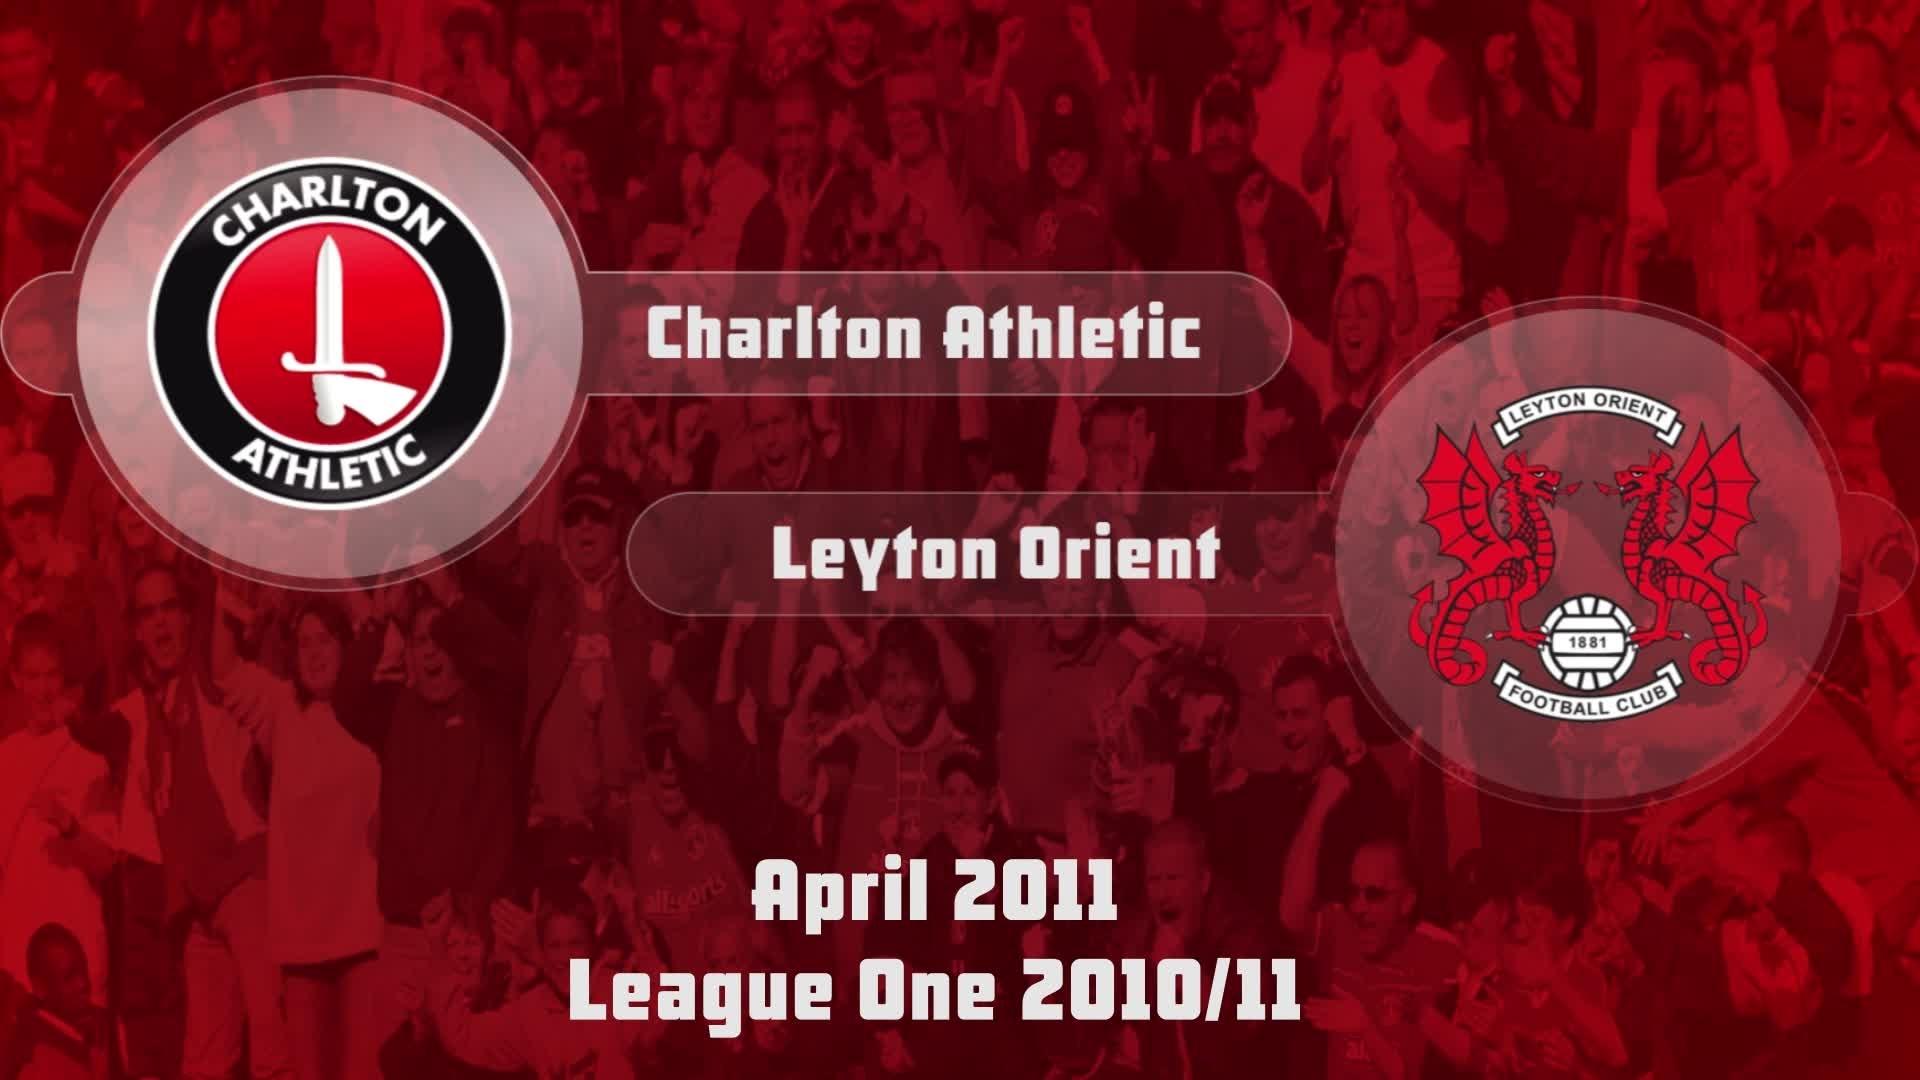 49 HIGHLIGHTS | Charlton 3 Leyton Orient 1 (April 2011)